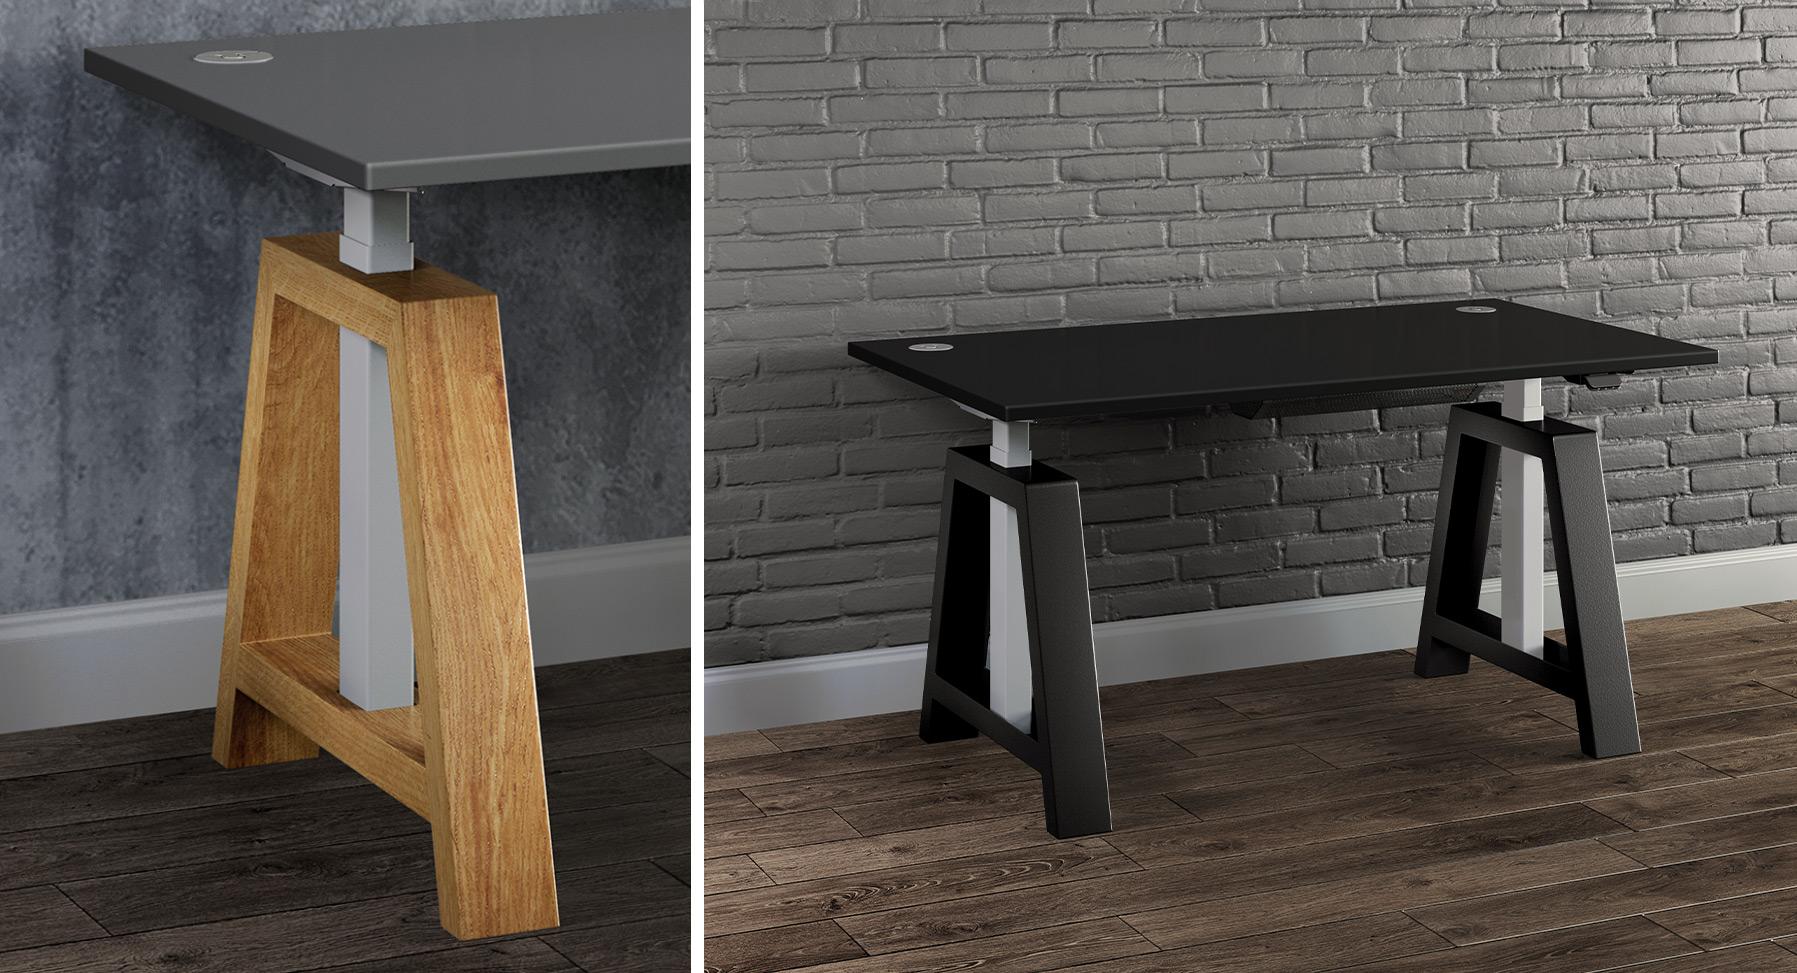 MT Millar - Furniture Rendering Detail Shots